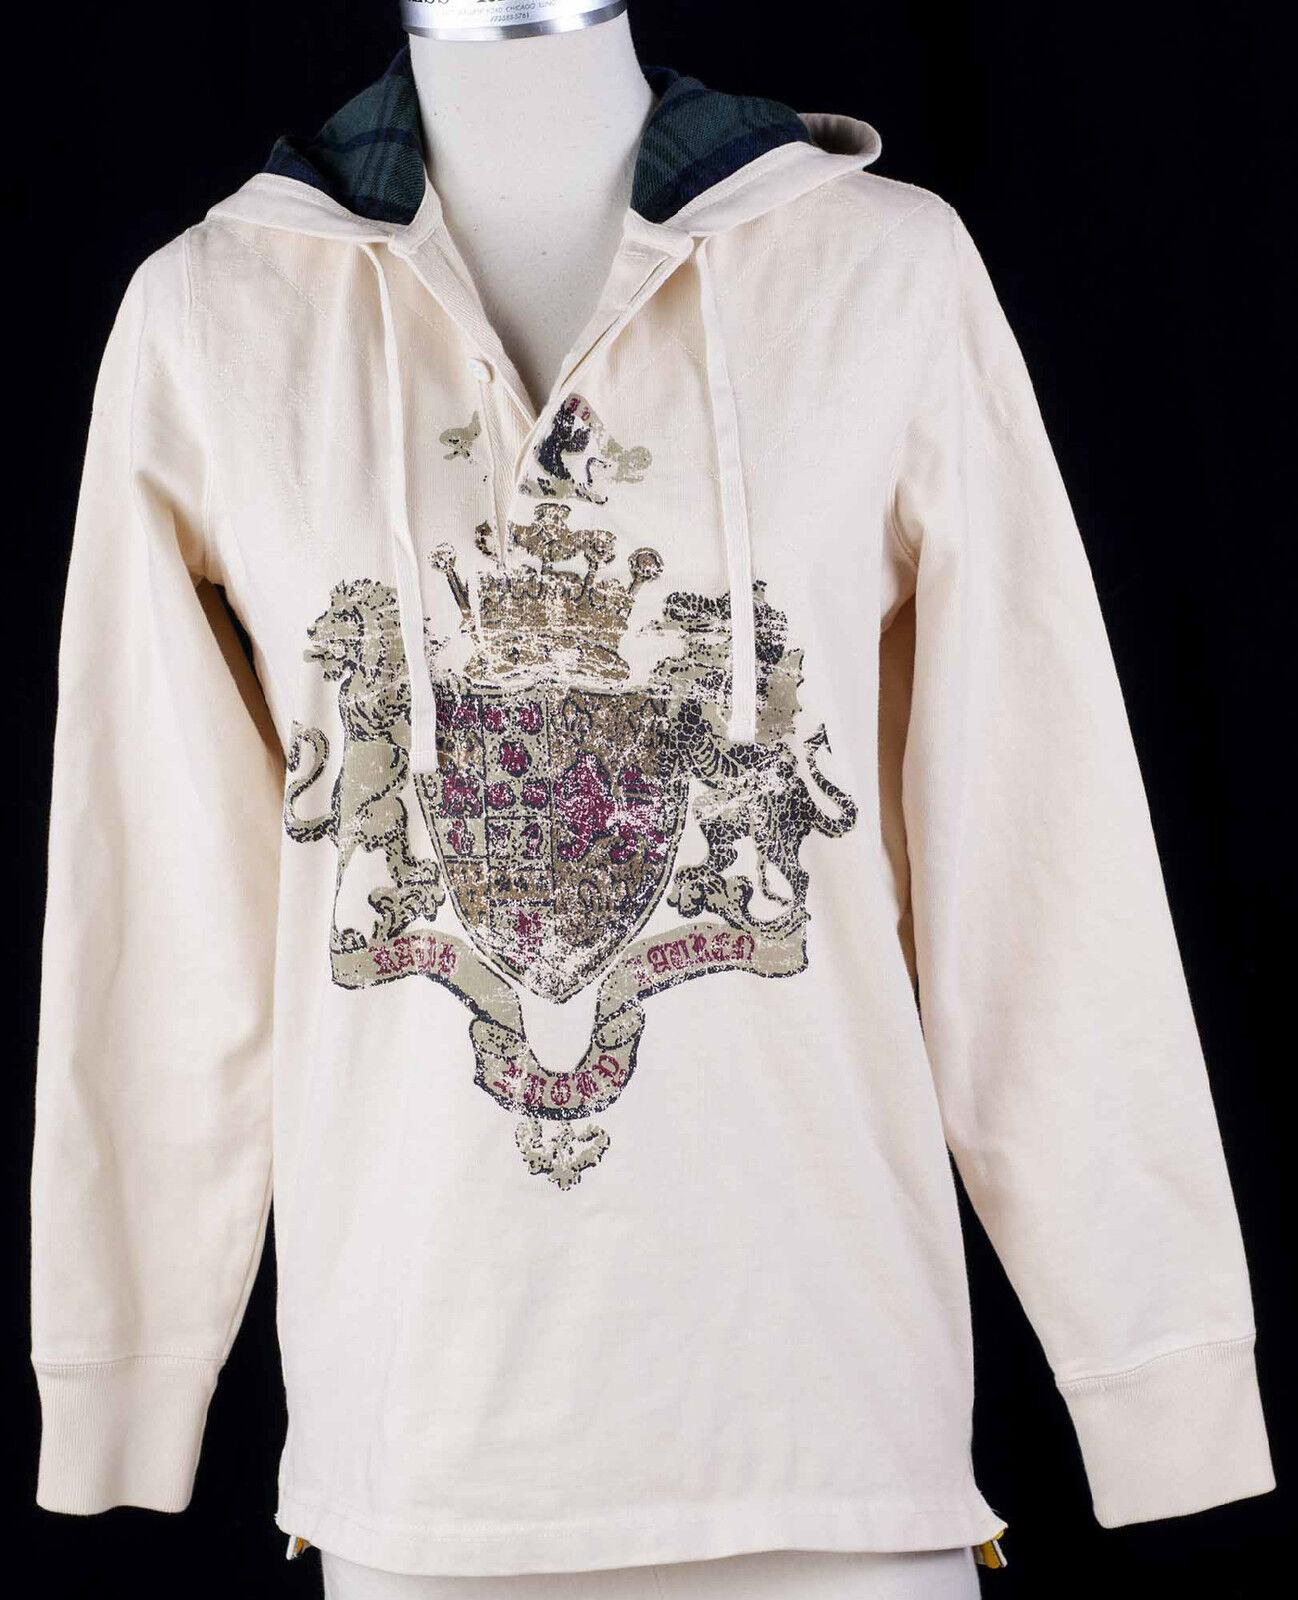 Ralph Lauren RUGBY Hoodie Large Crest Relaxed Fit  Herren Shirt Sz M